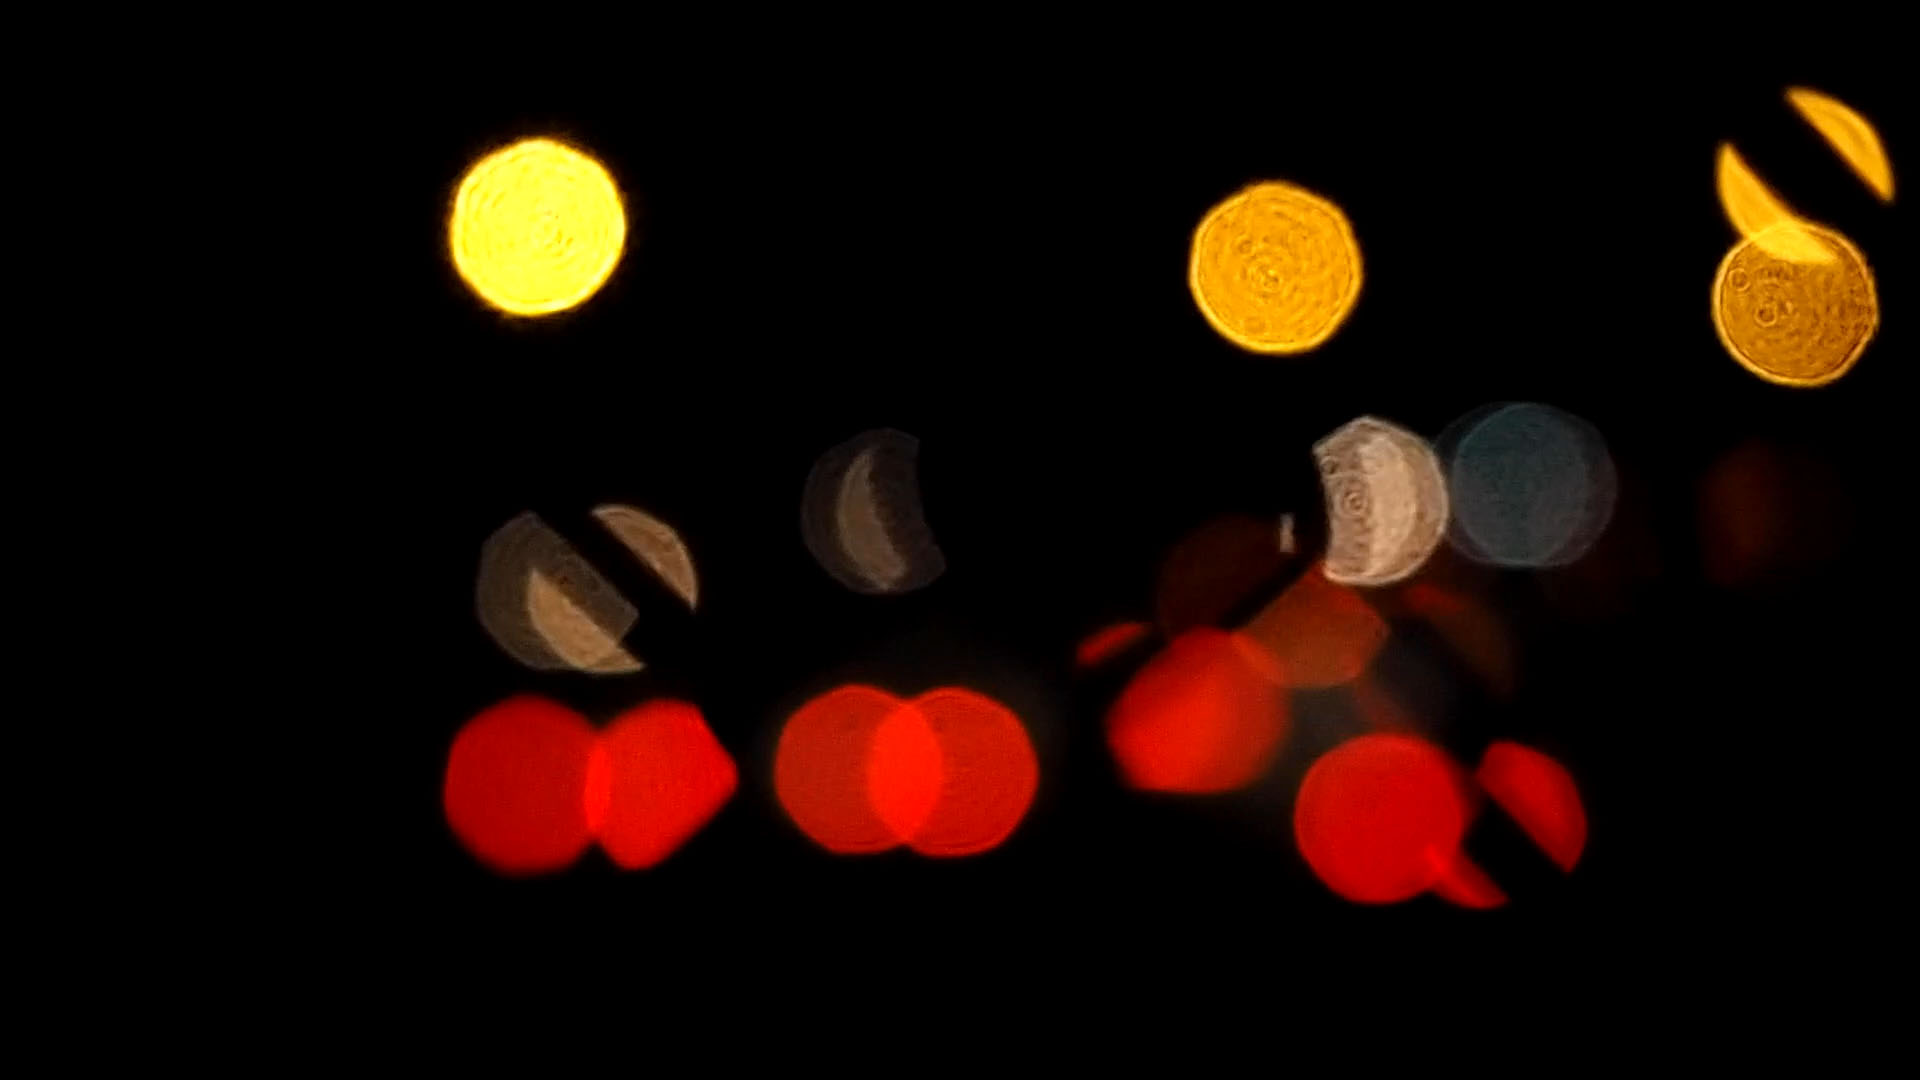 Blurred Car Lights